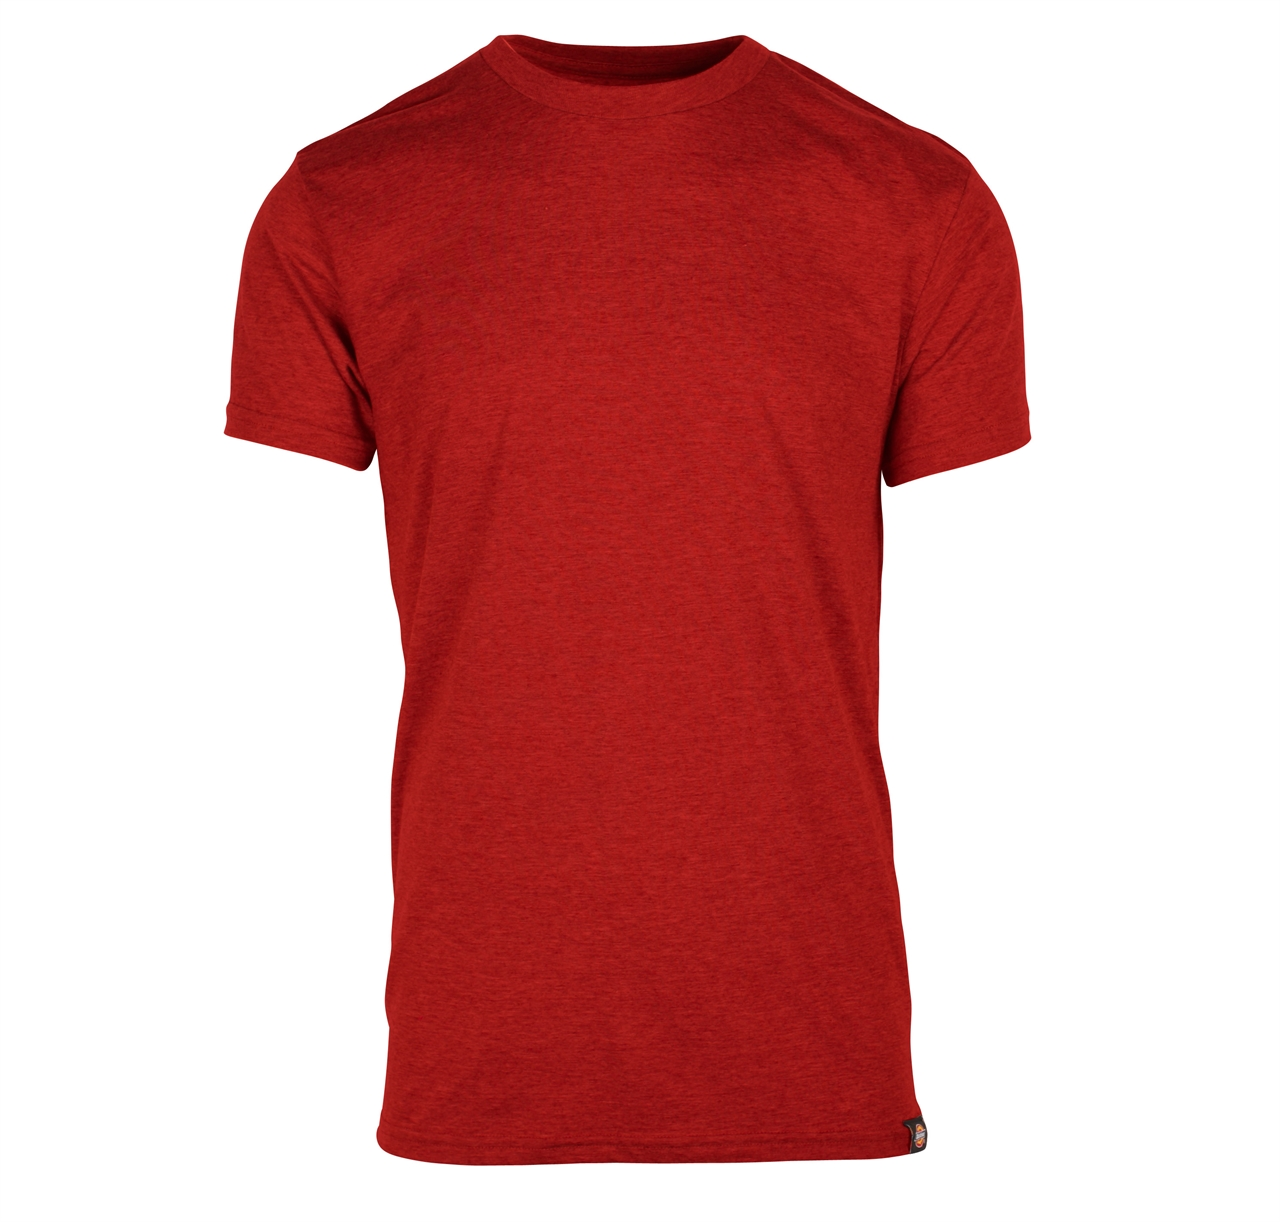 Picture of Dickies Short Sleeve Melange T-Shirt